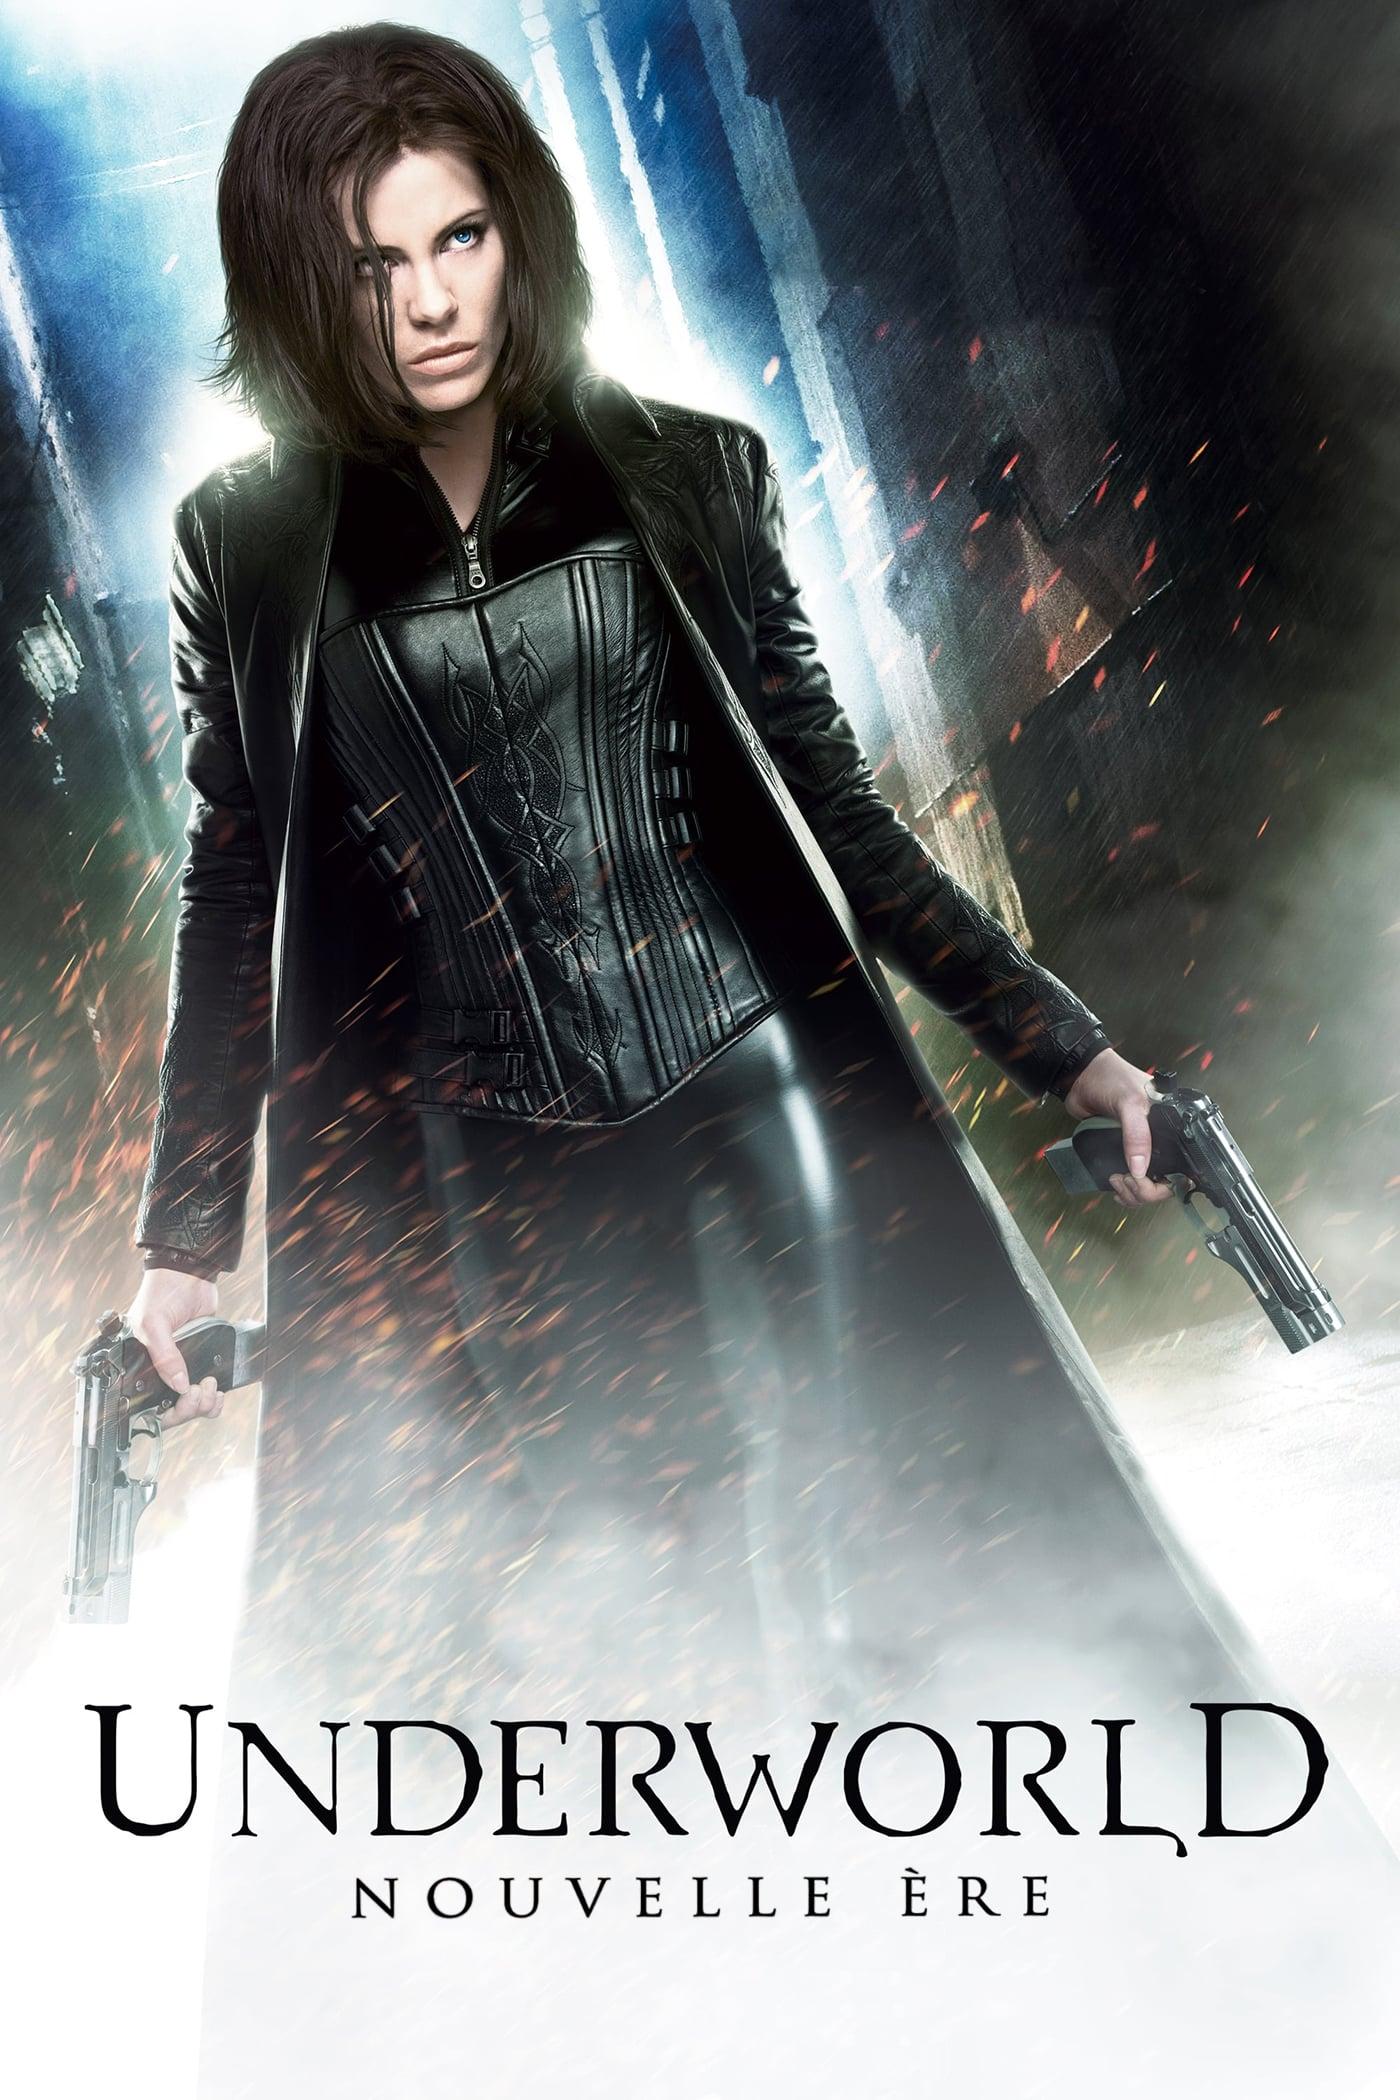 Underworld 1 Streaming